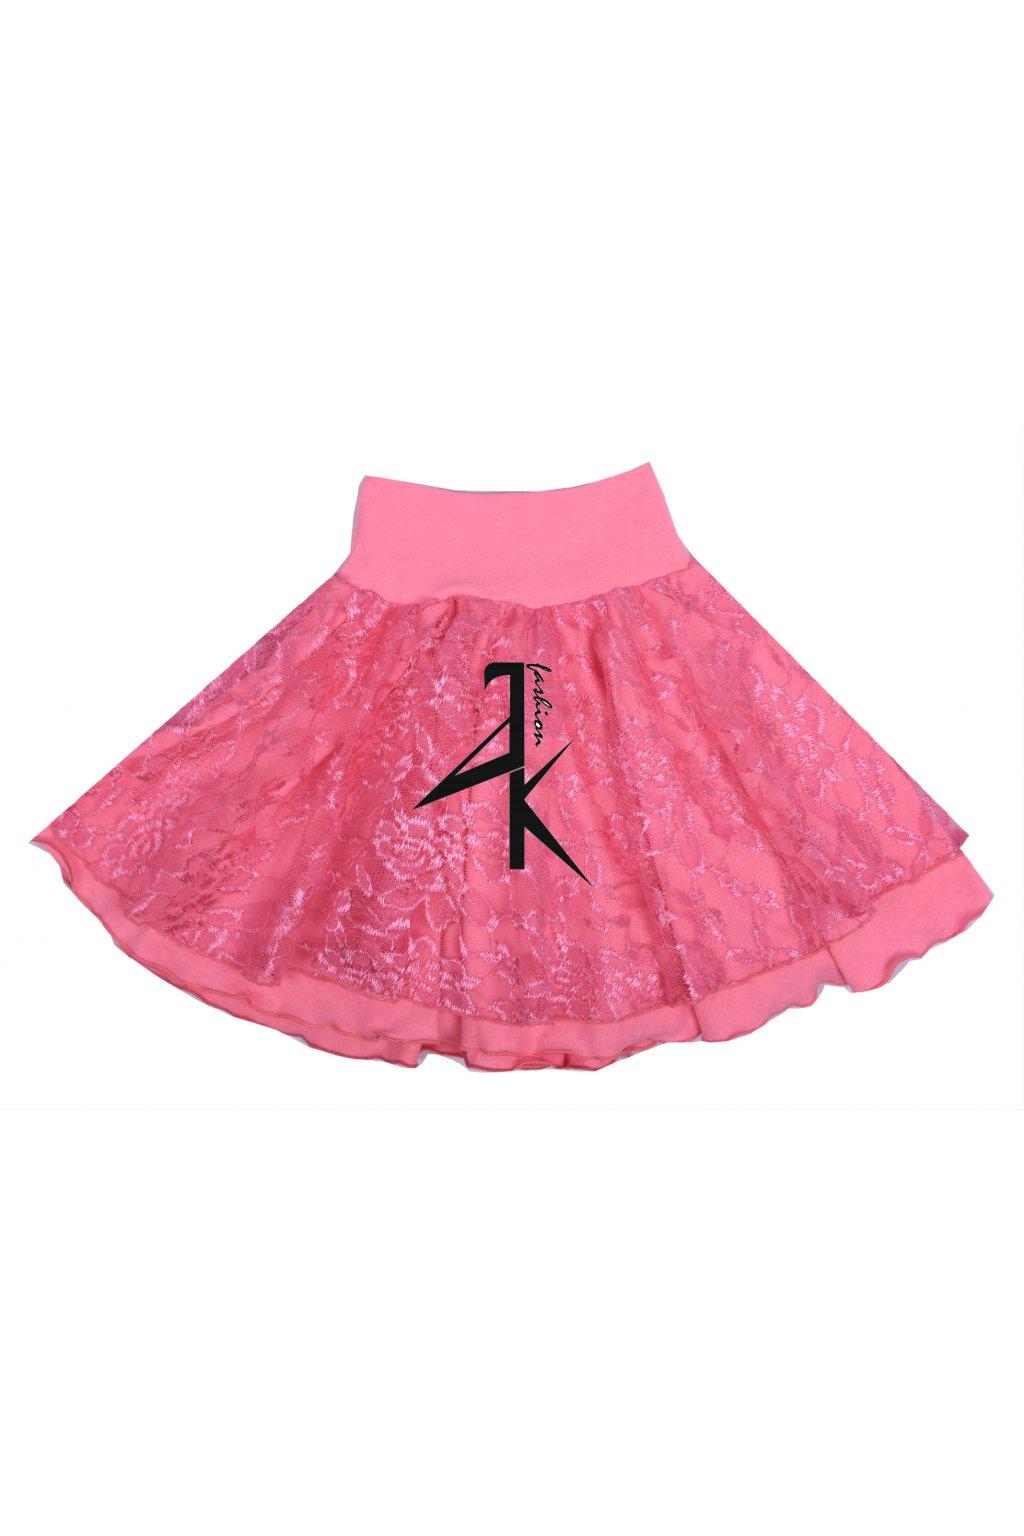 detske sukneb krajka pink 11115540